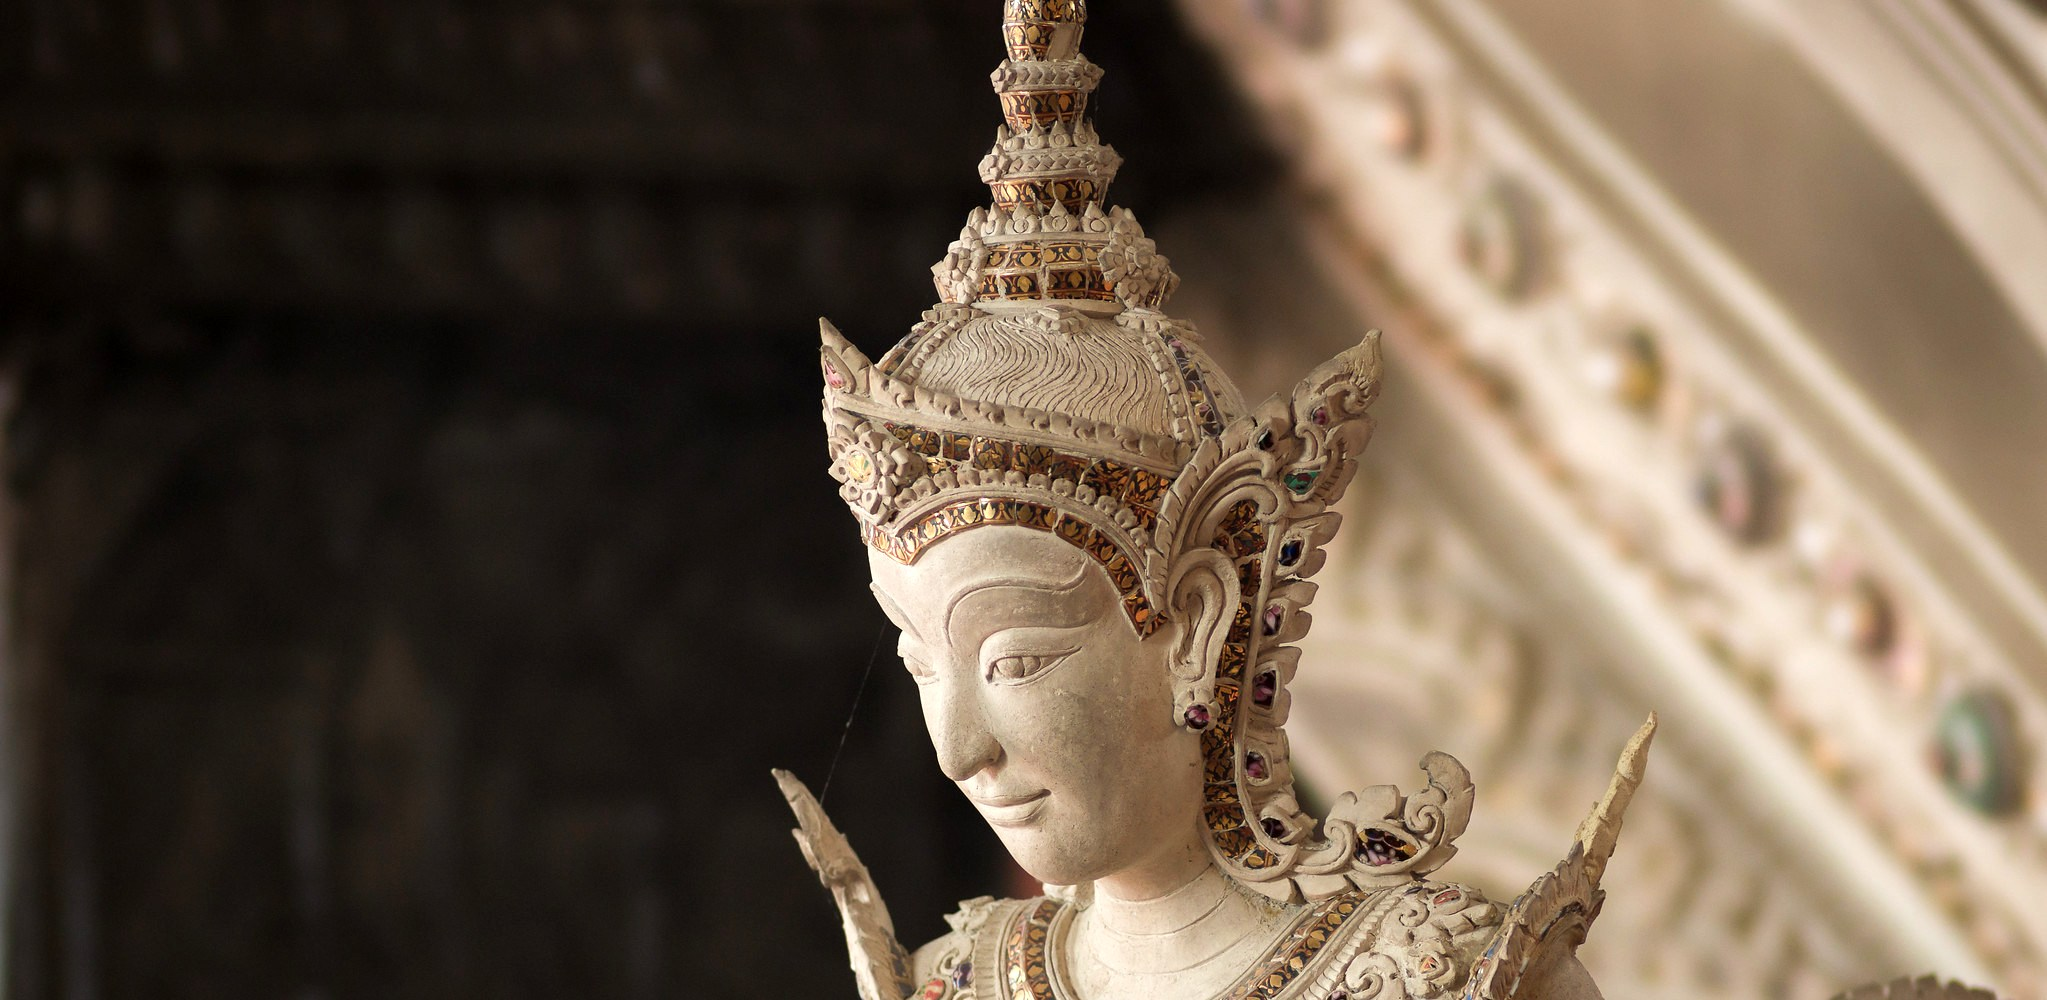 Sculpture in a museum in Bangkok